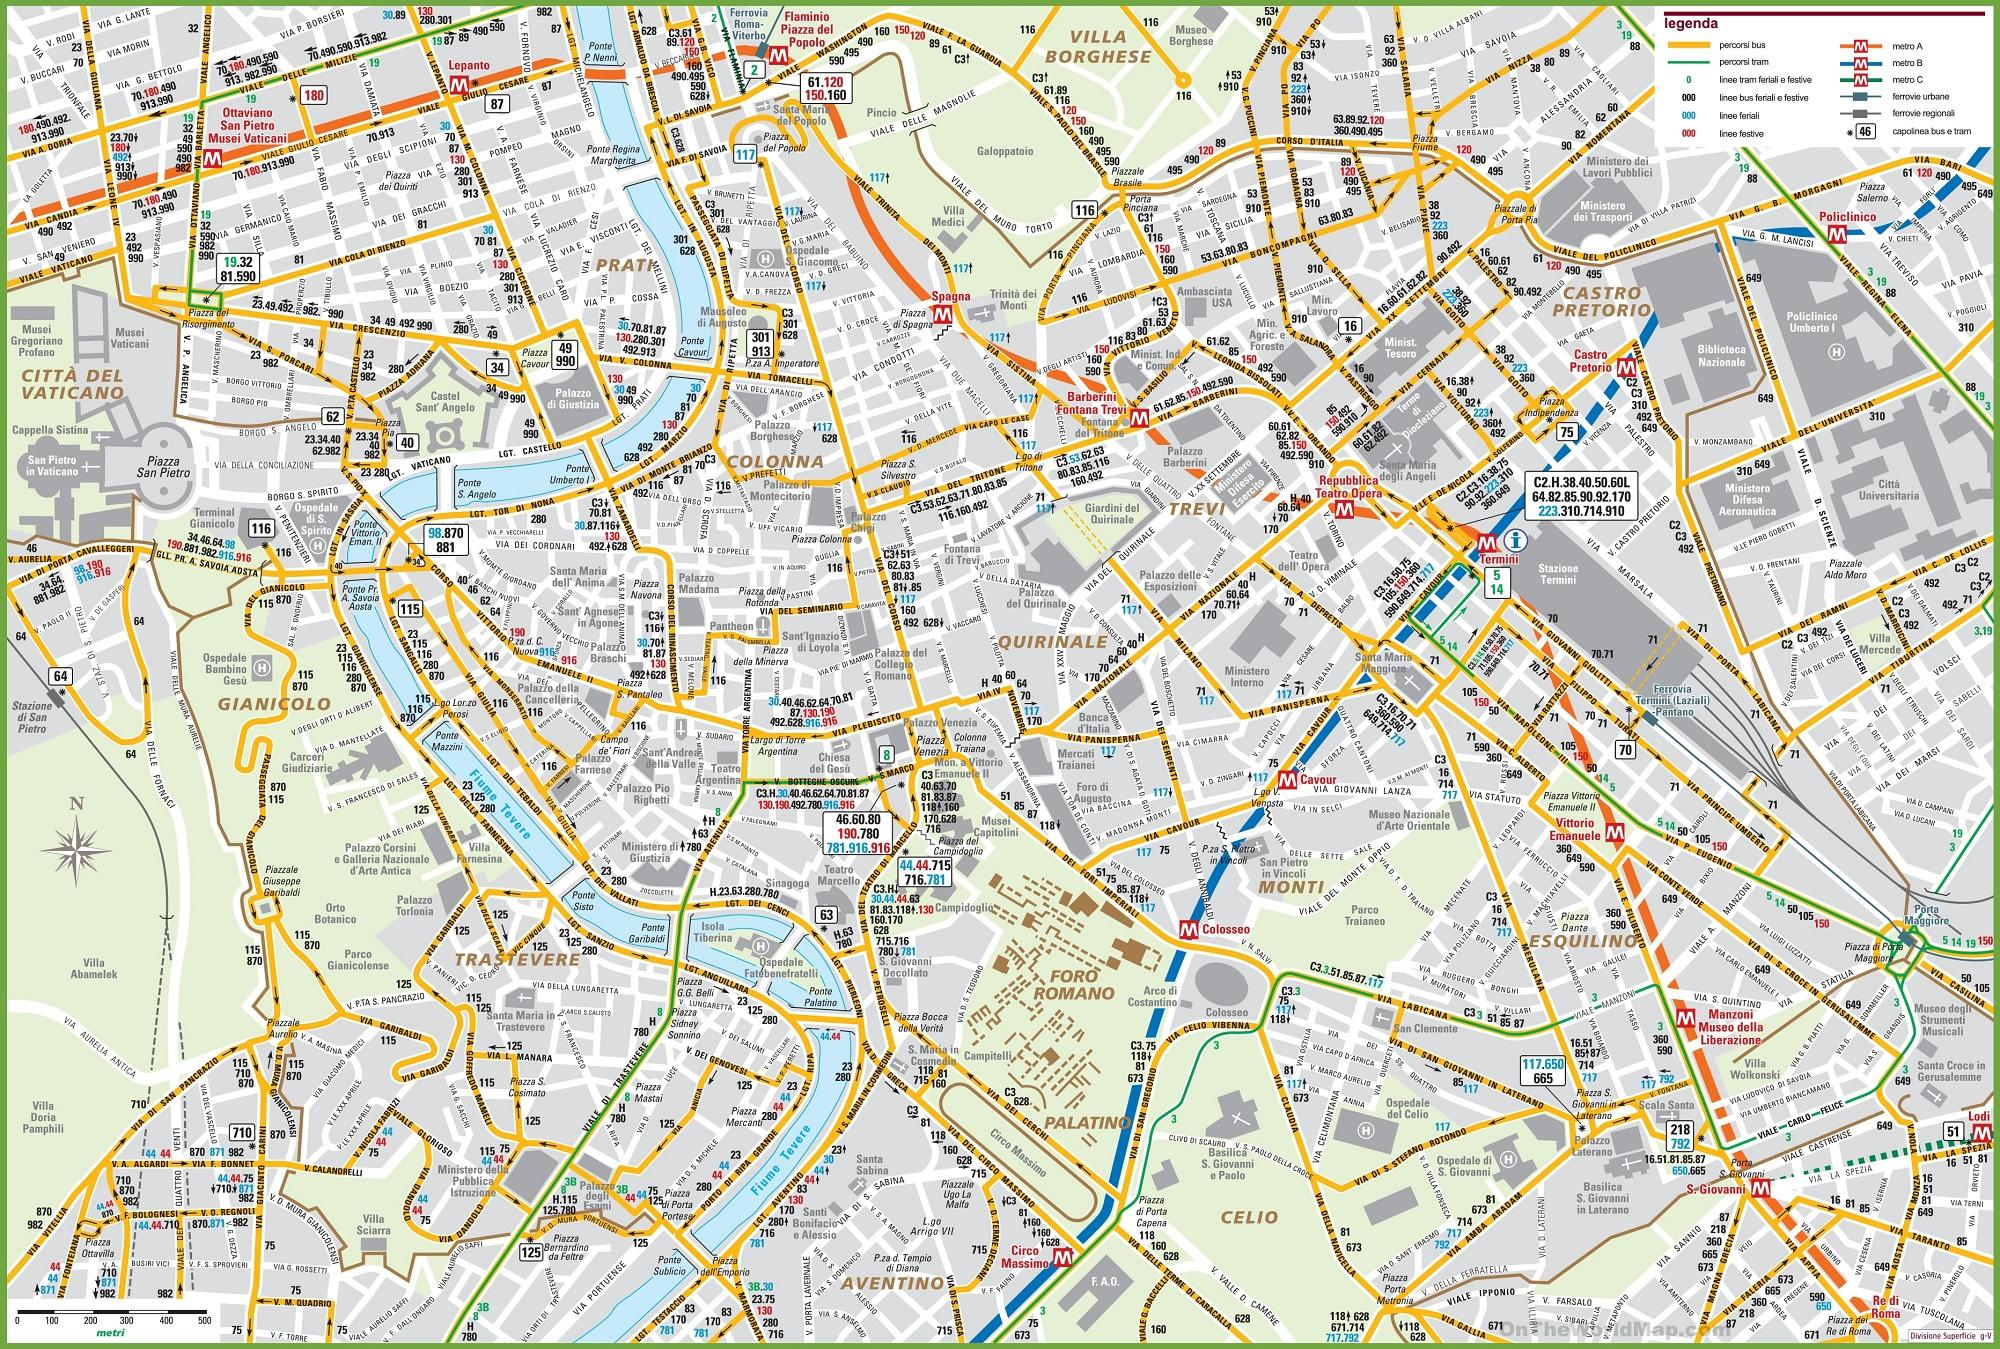 Cartina Autobus Roma.Metropolitana Di Roma Mappa Di Autobus Metro E Bus Mappa Di Roma Lazio Italia